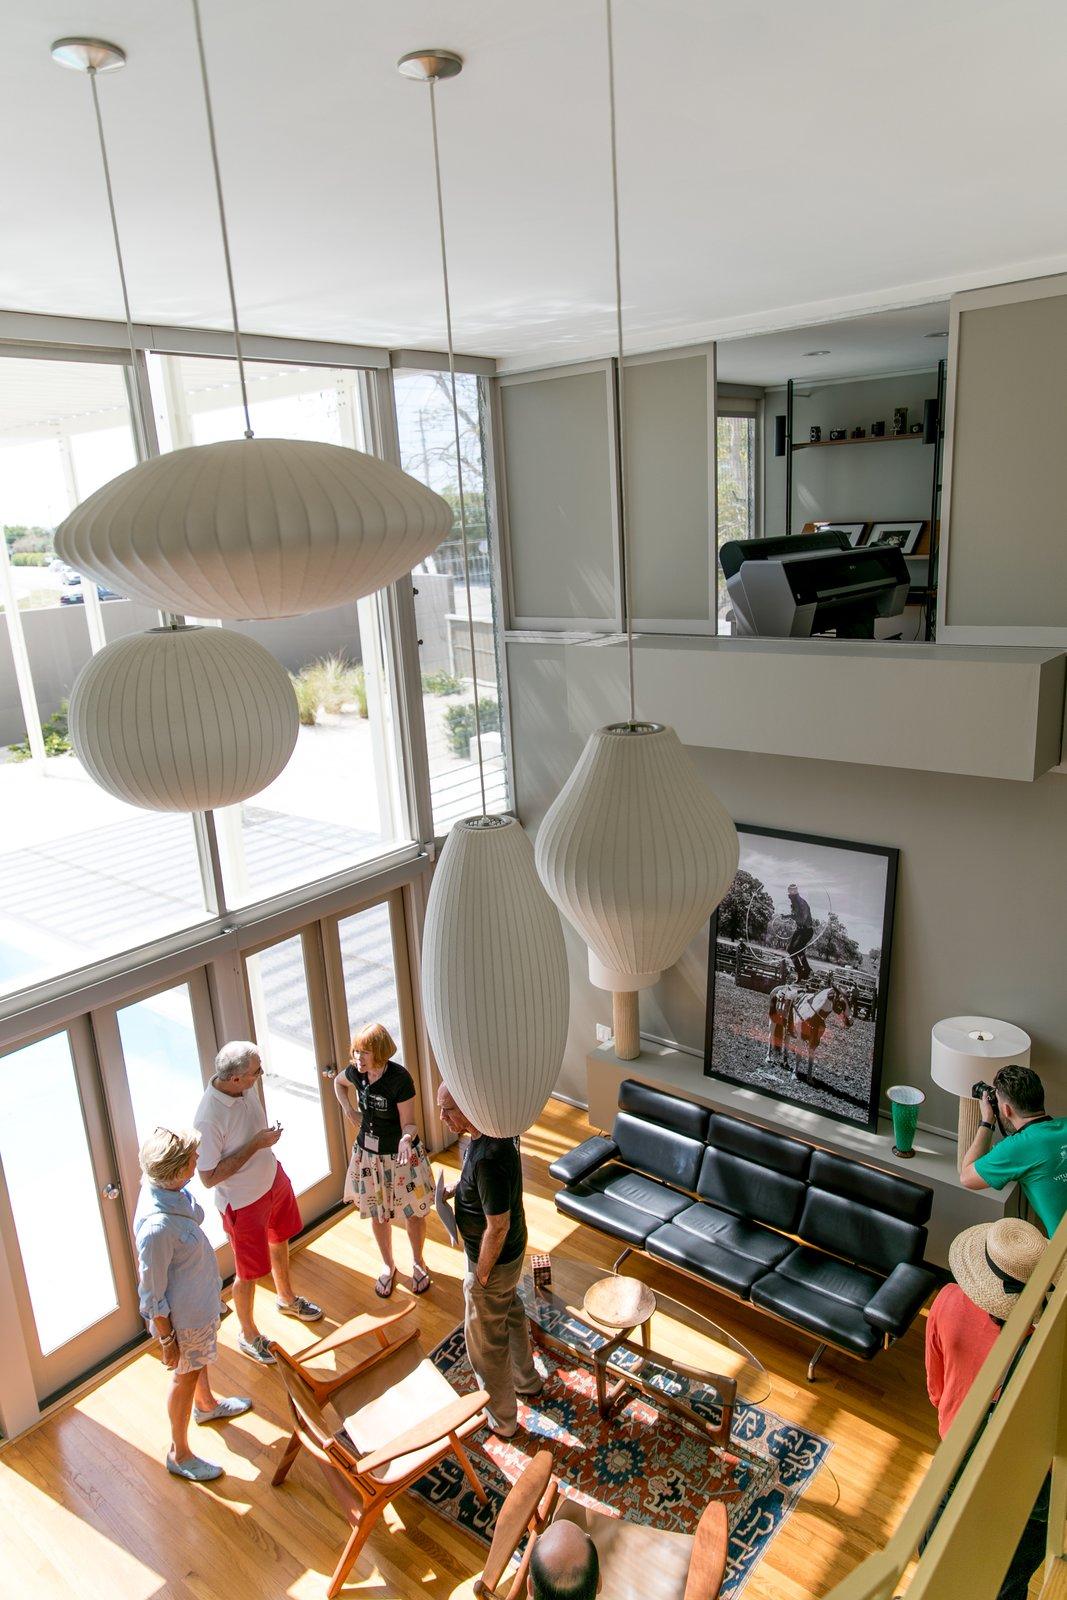 Living Room, Pendant Lighting, Chair, Medium Hardwood Floor, Sofa, Coffee Tables, and Lamps Umbrella House, living room  Umbrella House